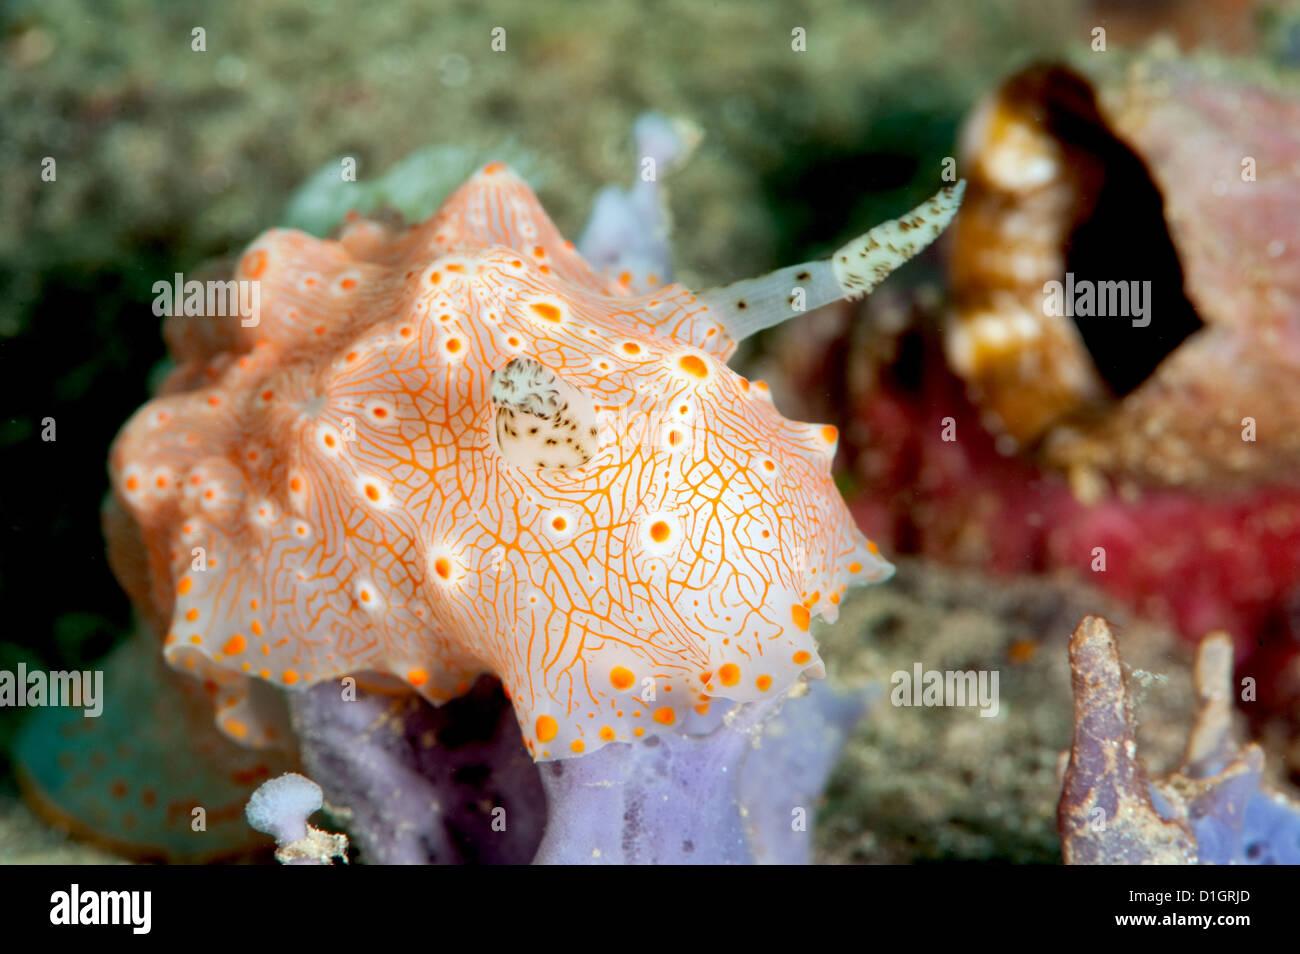 Halgerda carlsoni nudibranch, Sulawesi, Indonesia, Southeast Asia, Asia - Stock Image